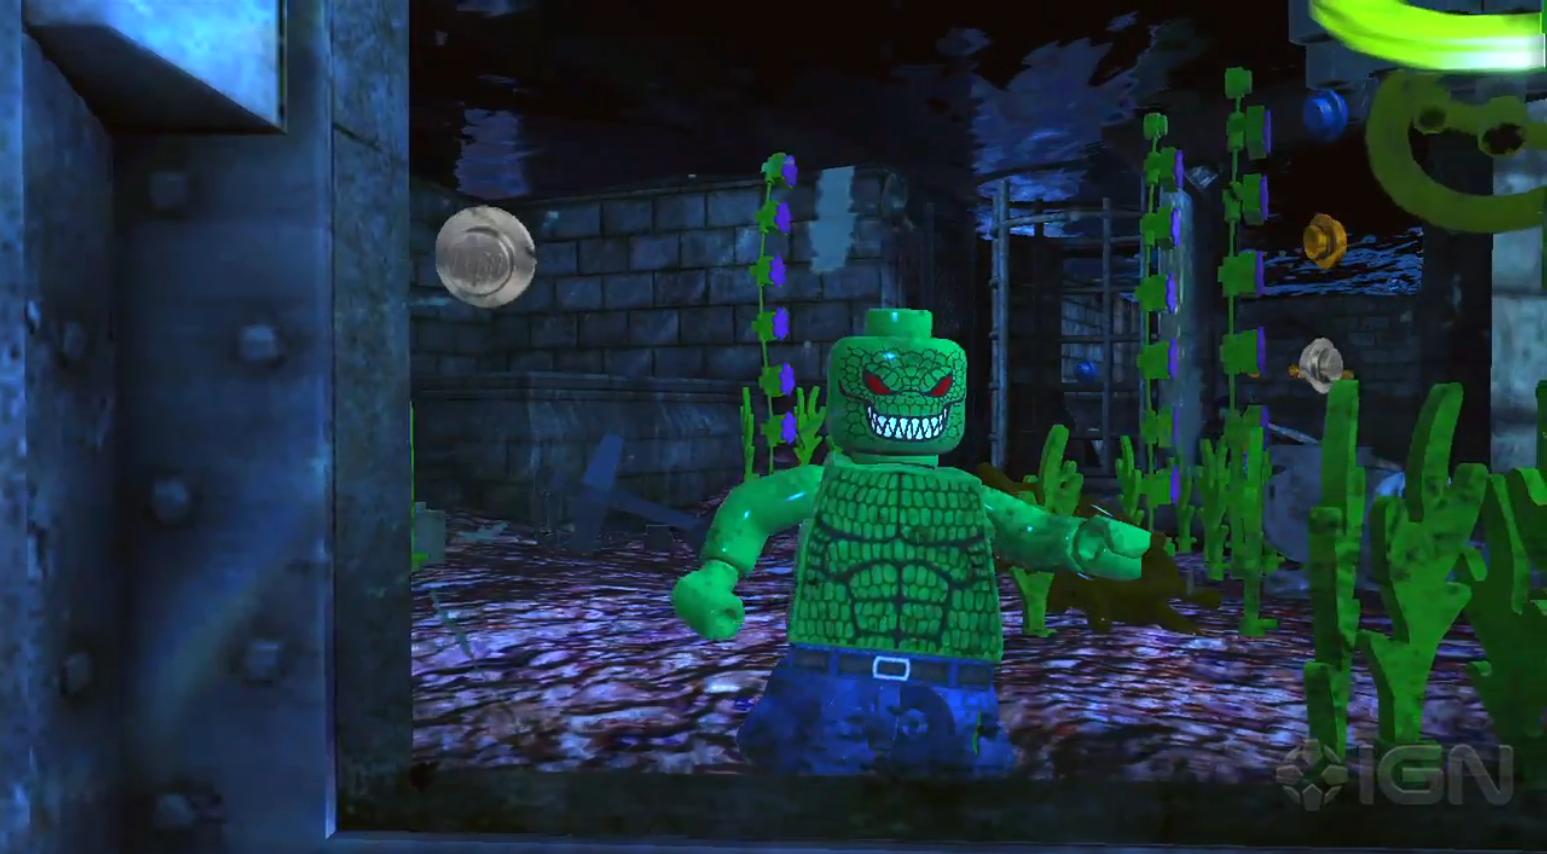 Image - Killer Croc LB2.png - Brickipedia, the LEGO Wiki